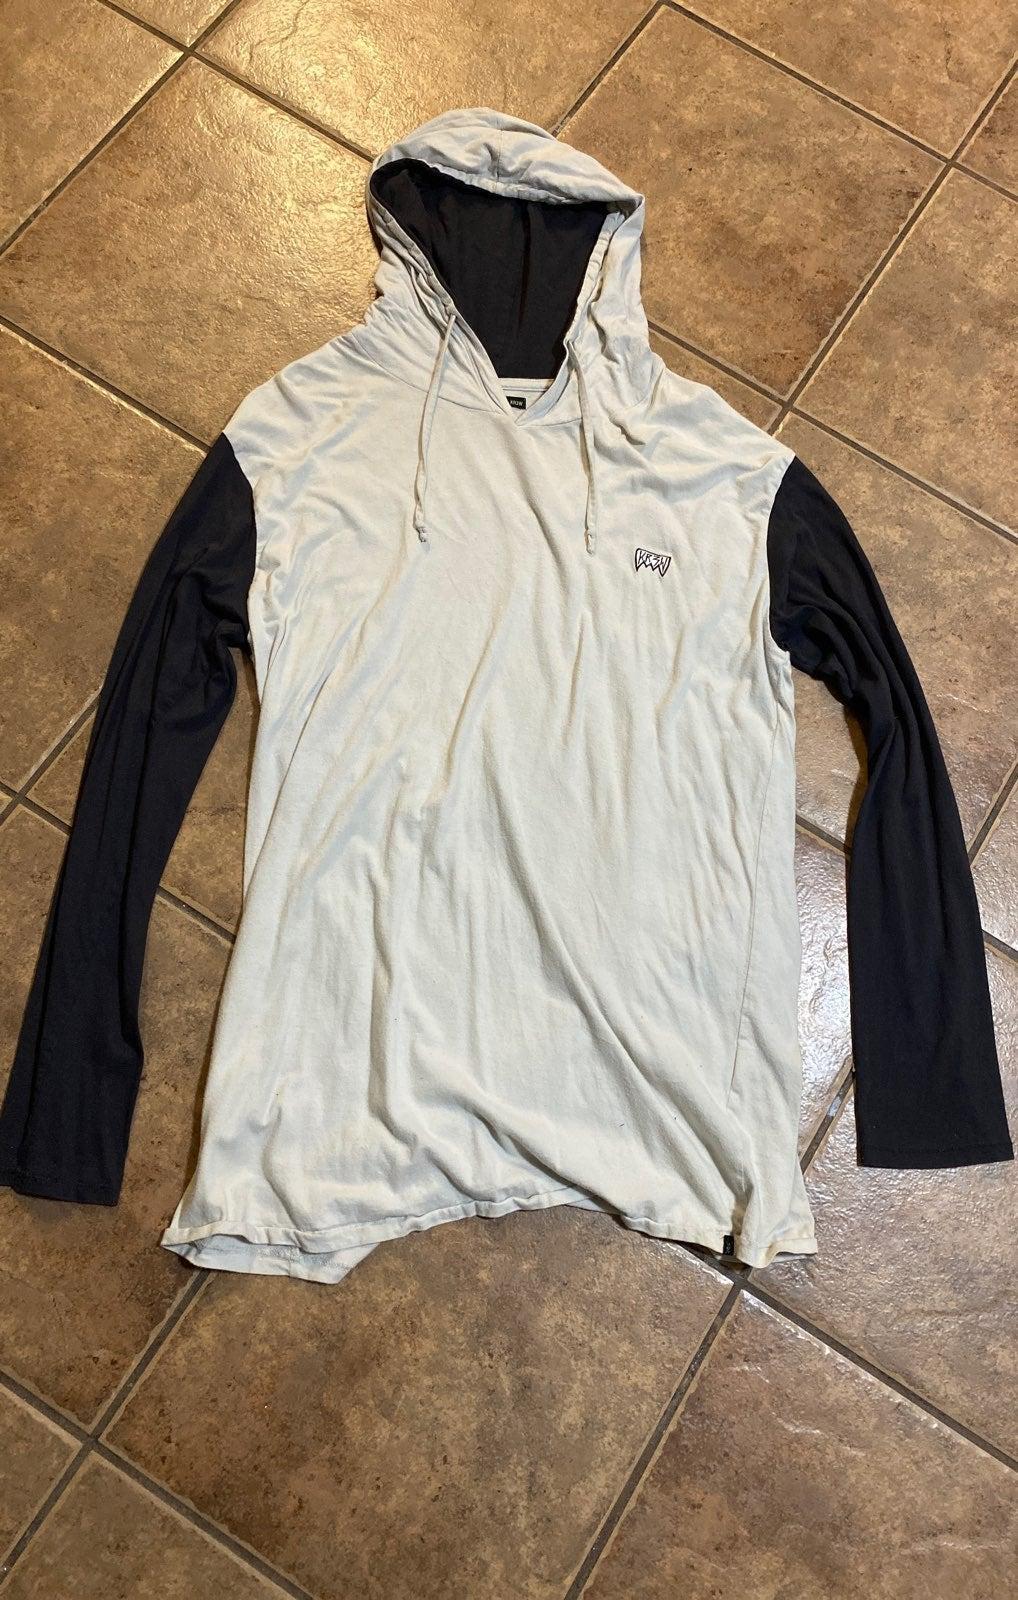 Krew Hoodie/shirt